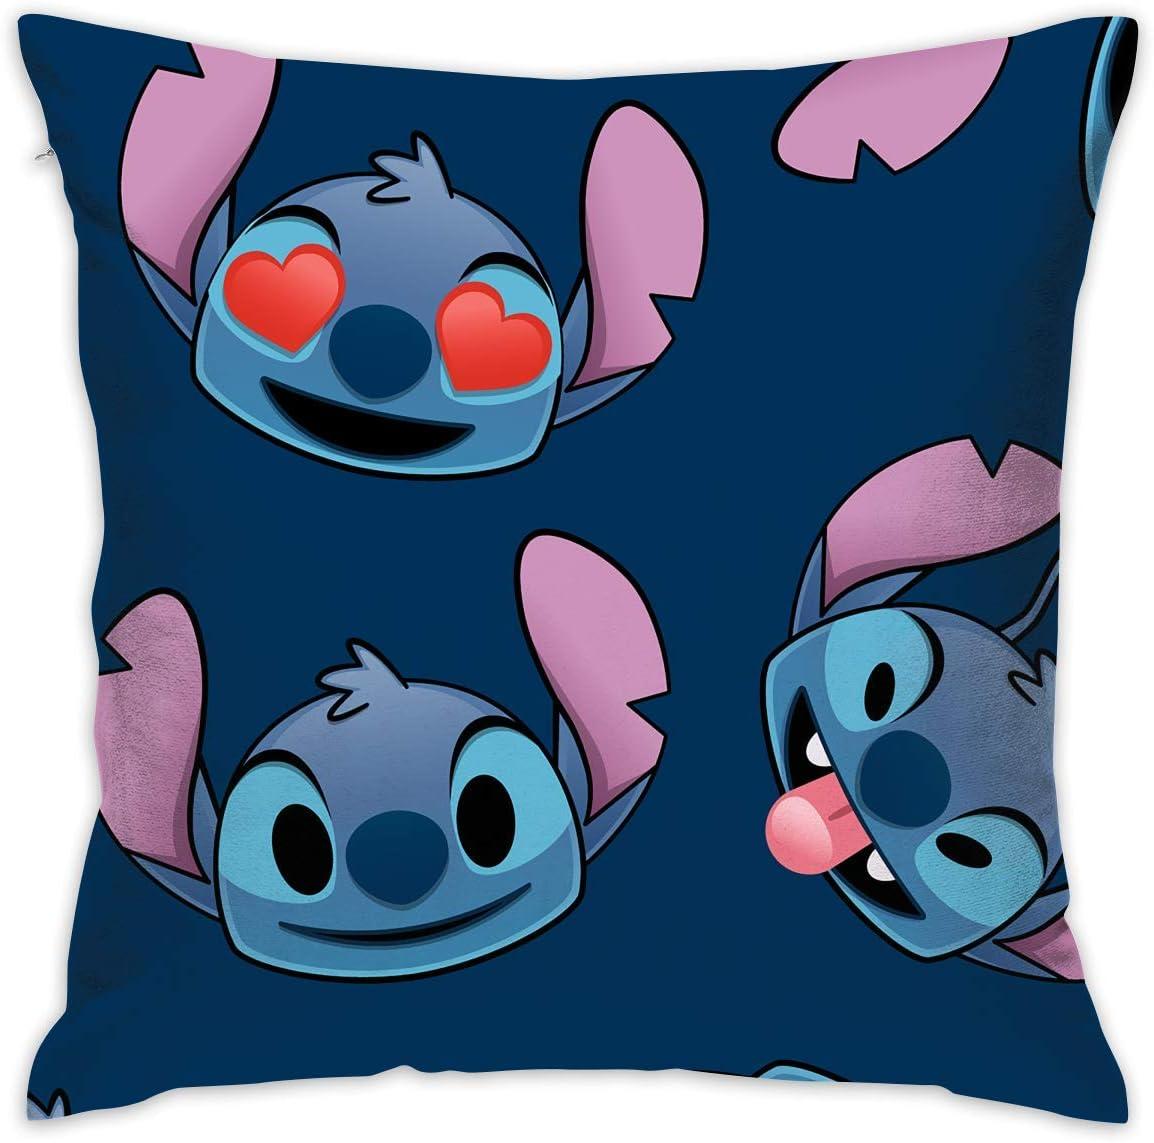 SunJingJingRTUJ Pillow Cover Cushion